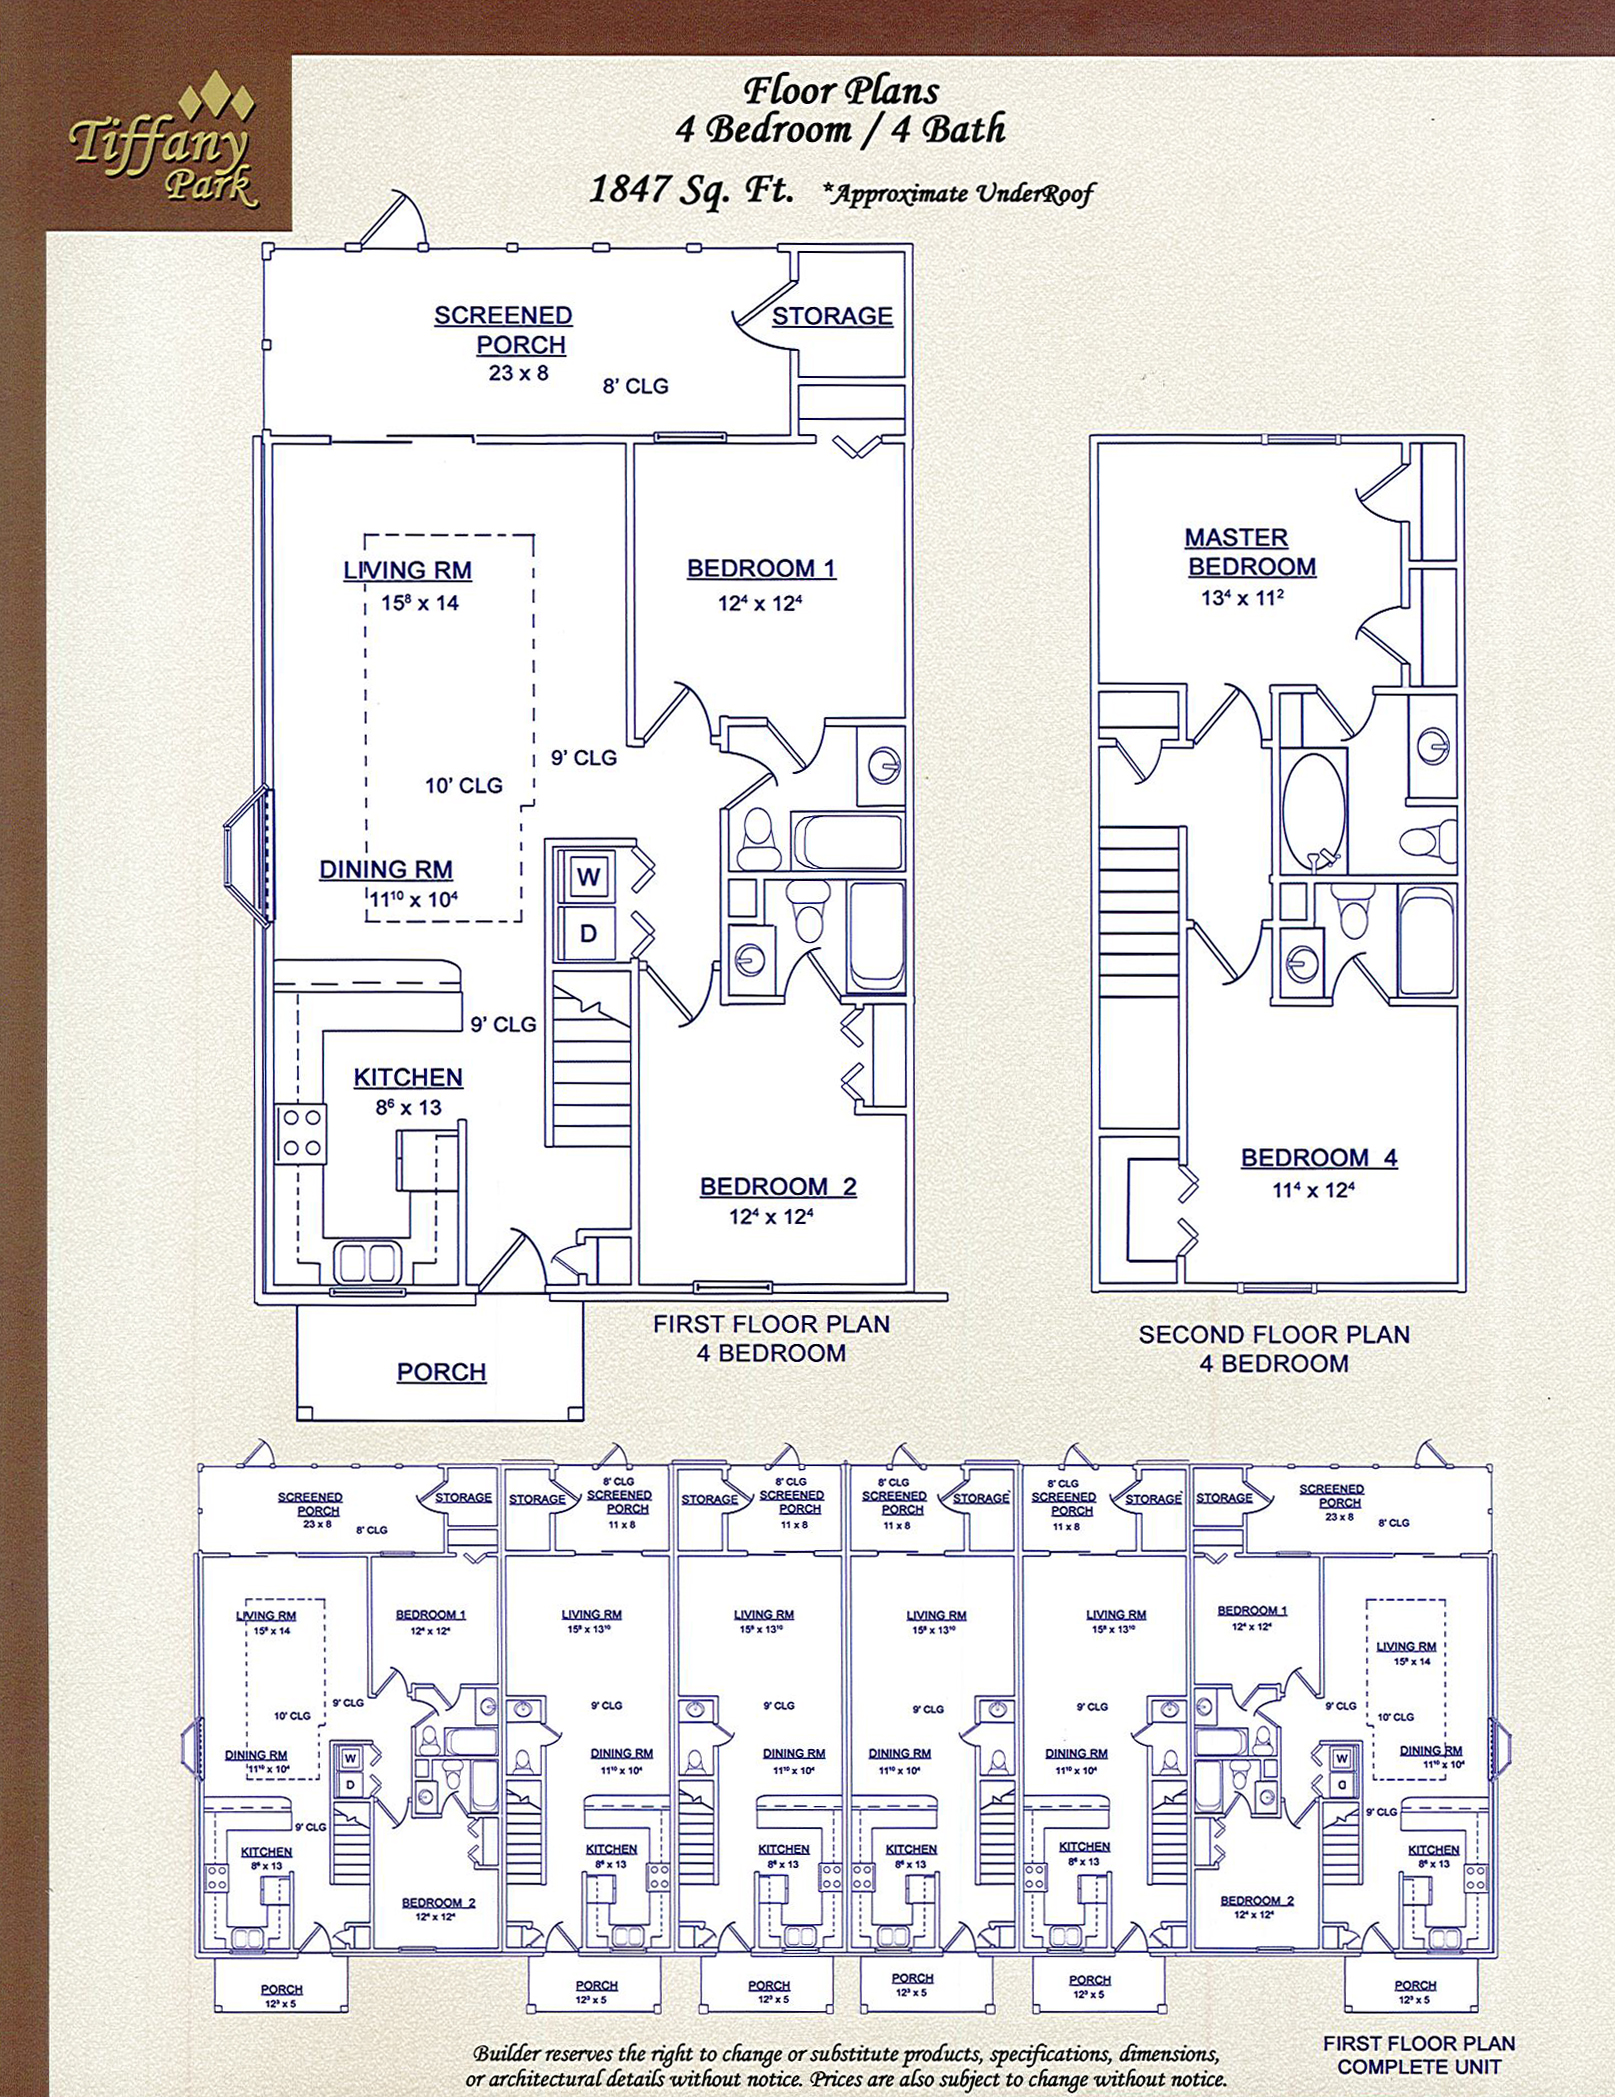 floor plan 4bdrm